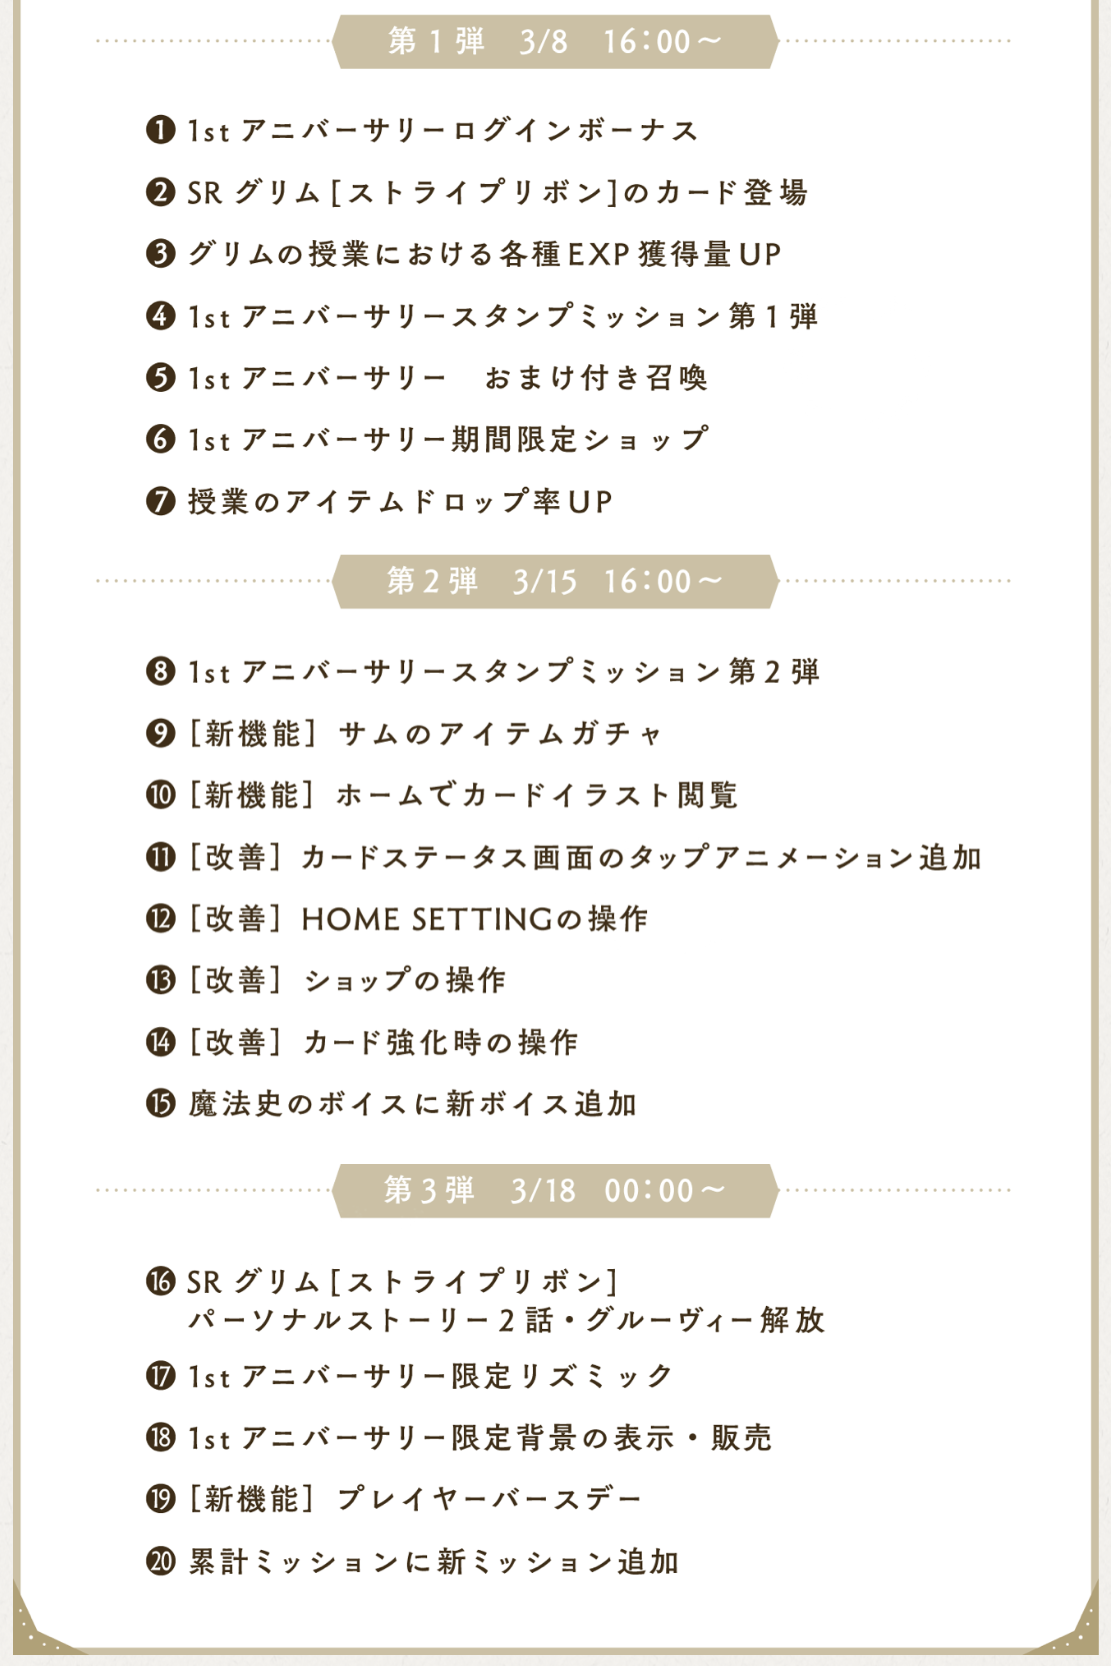 f:id:motimoti444:20210305185100p:plain